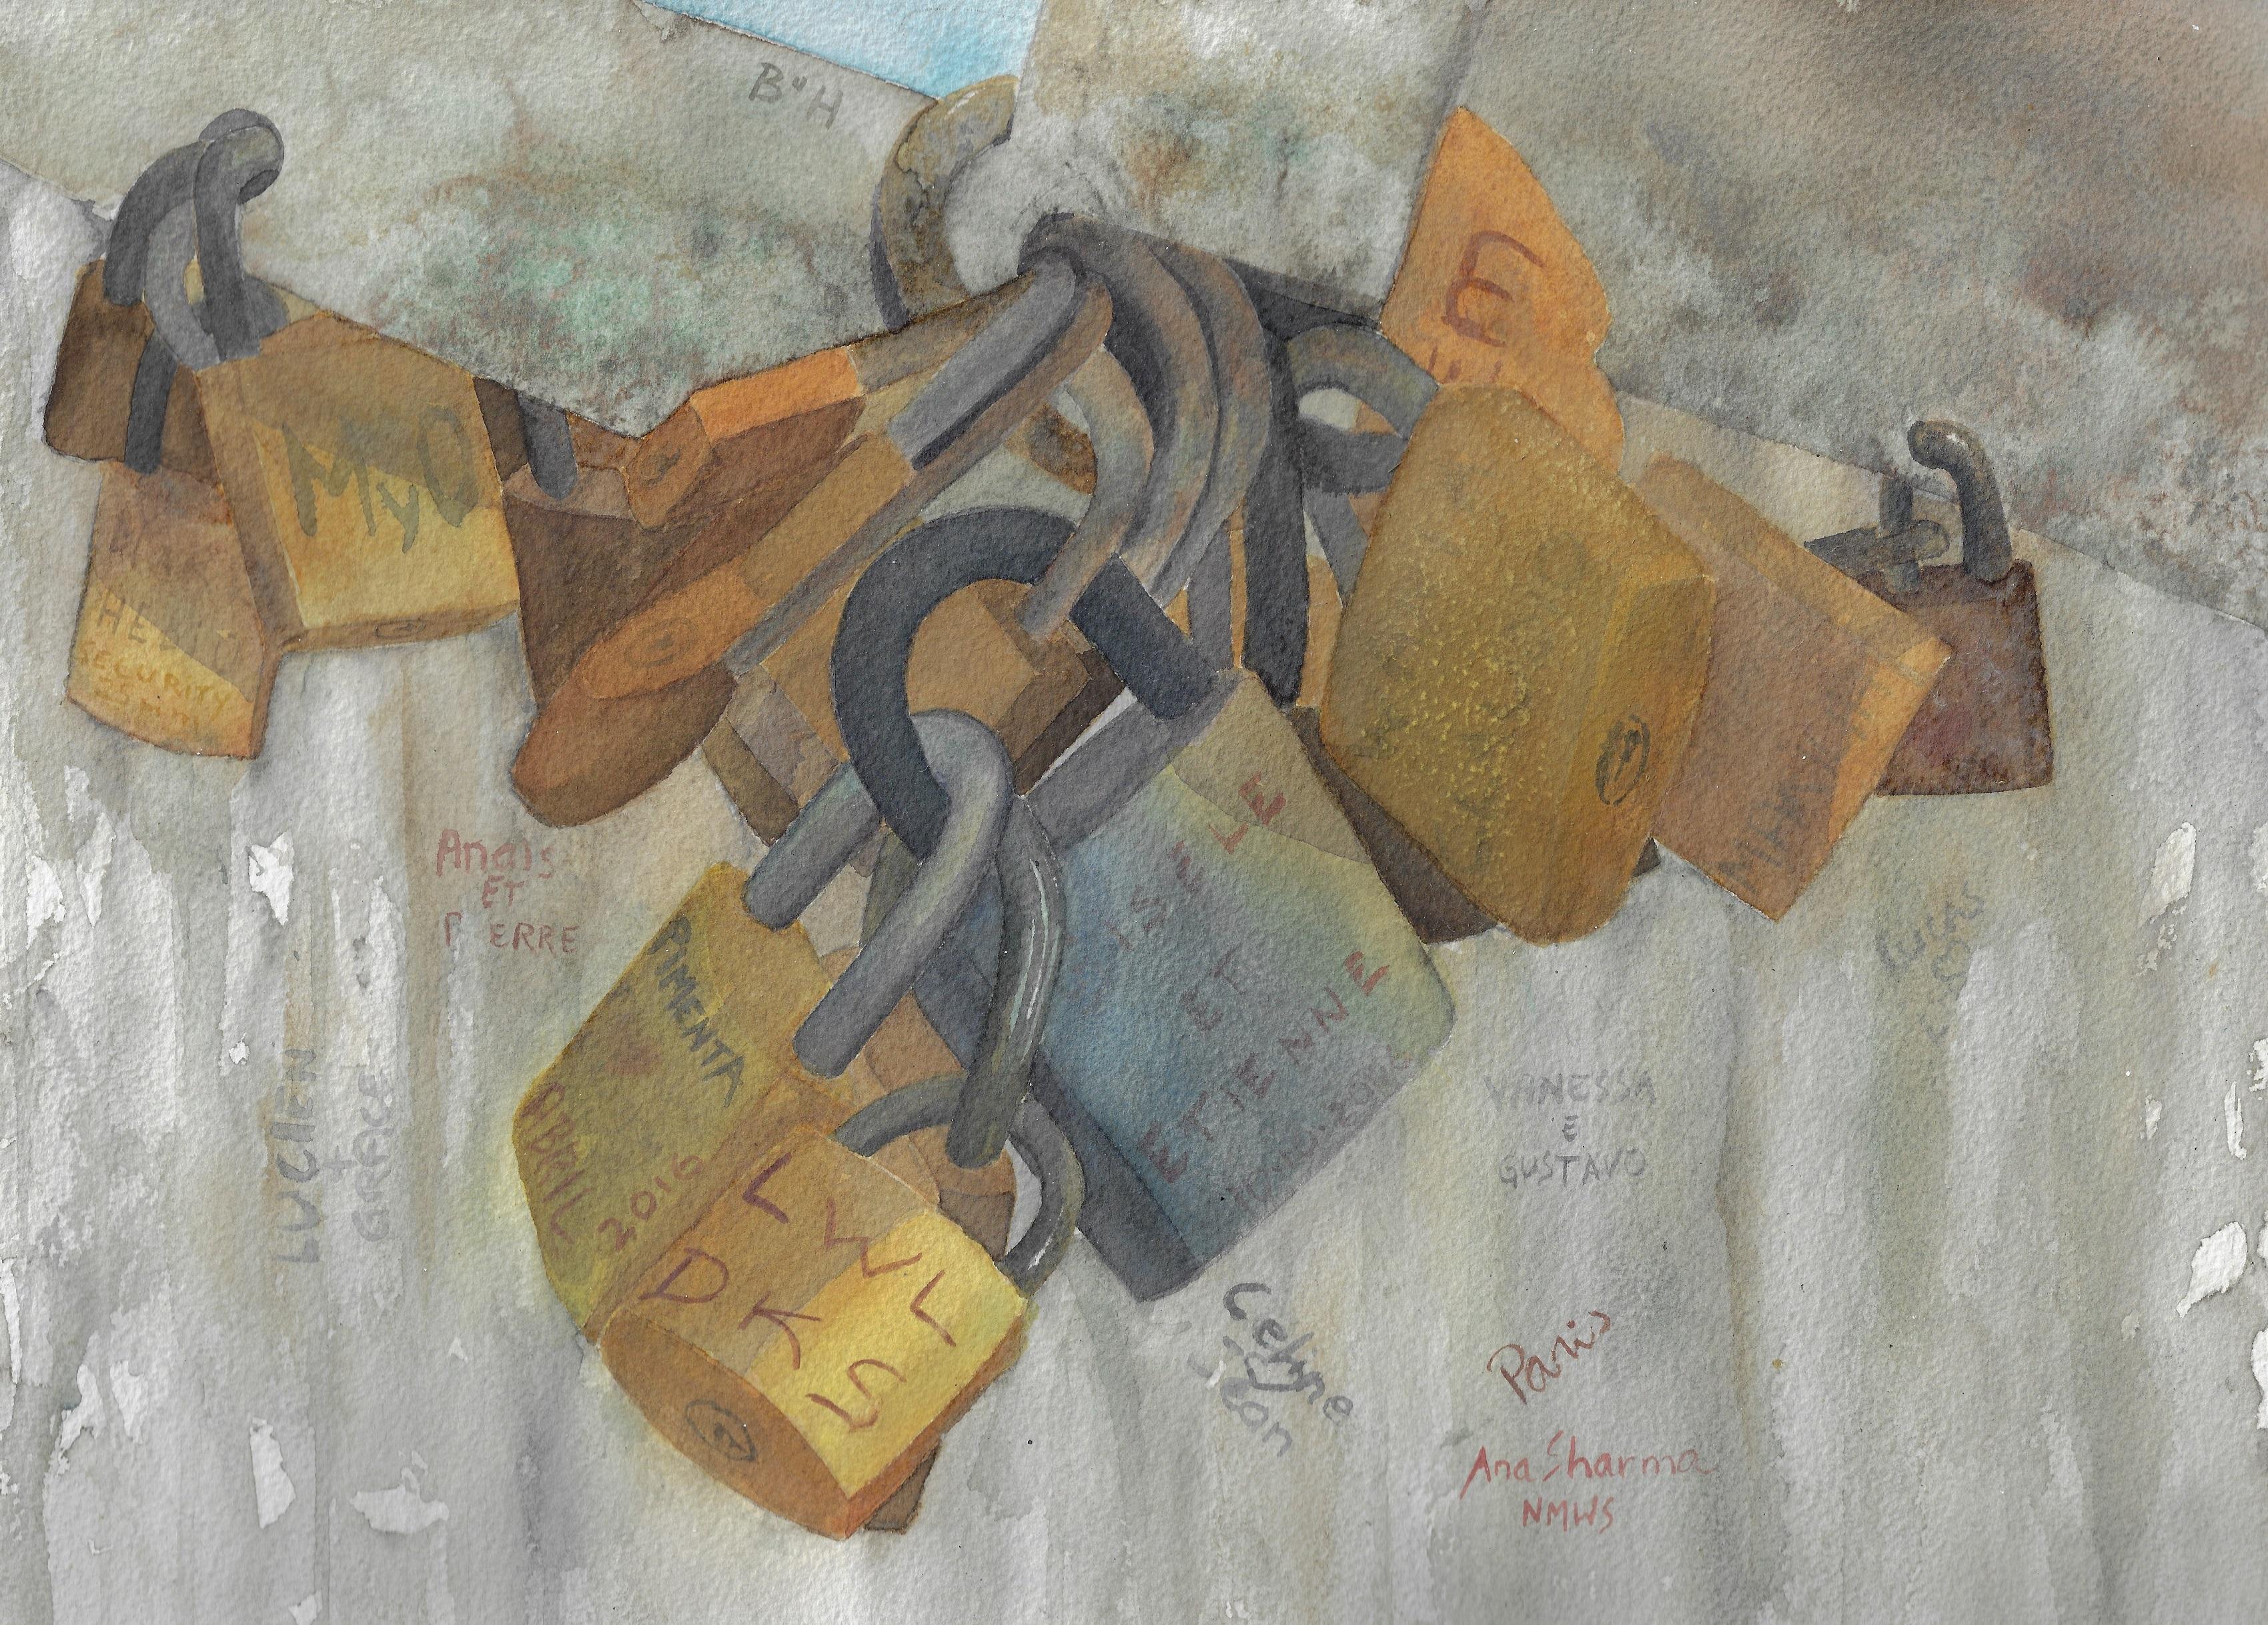 Love-locks Under The Brigde